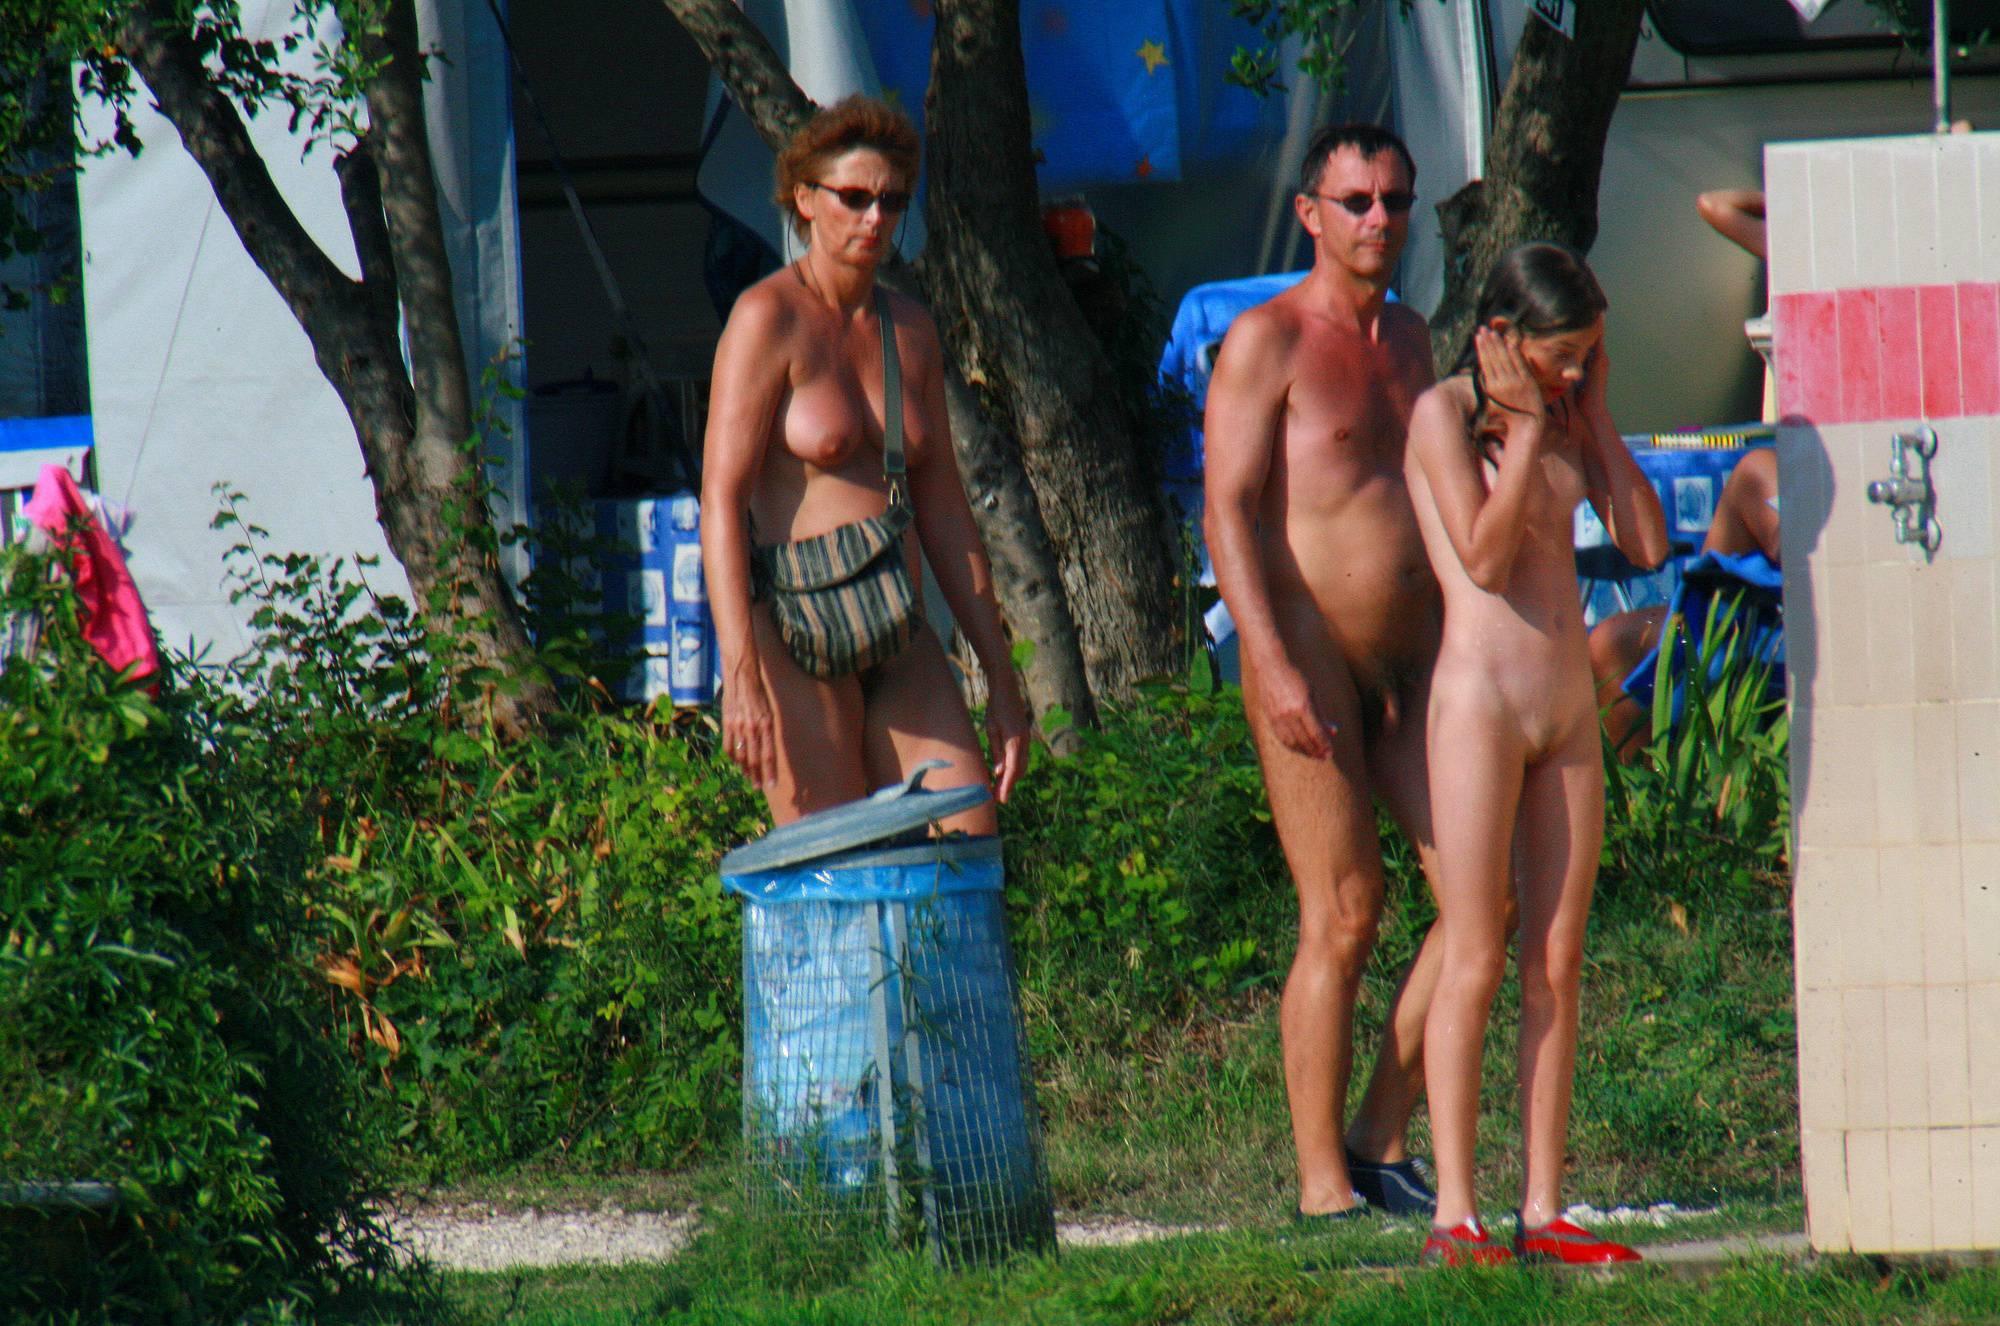 Nudist Pics Ula FKK Boating Family - 1